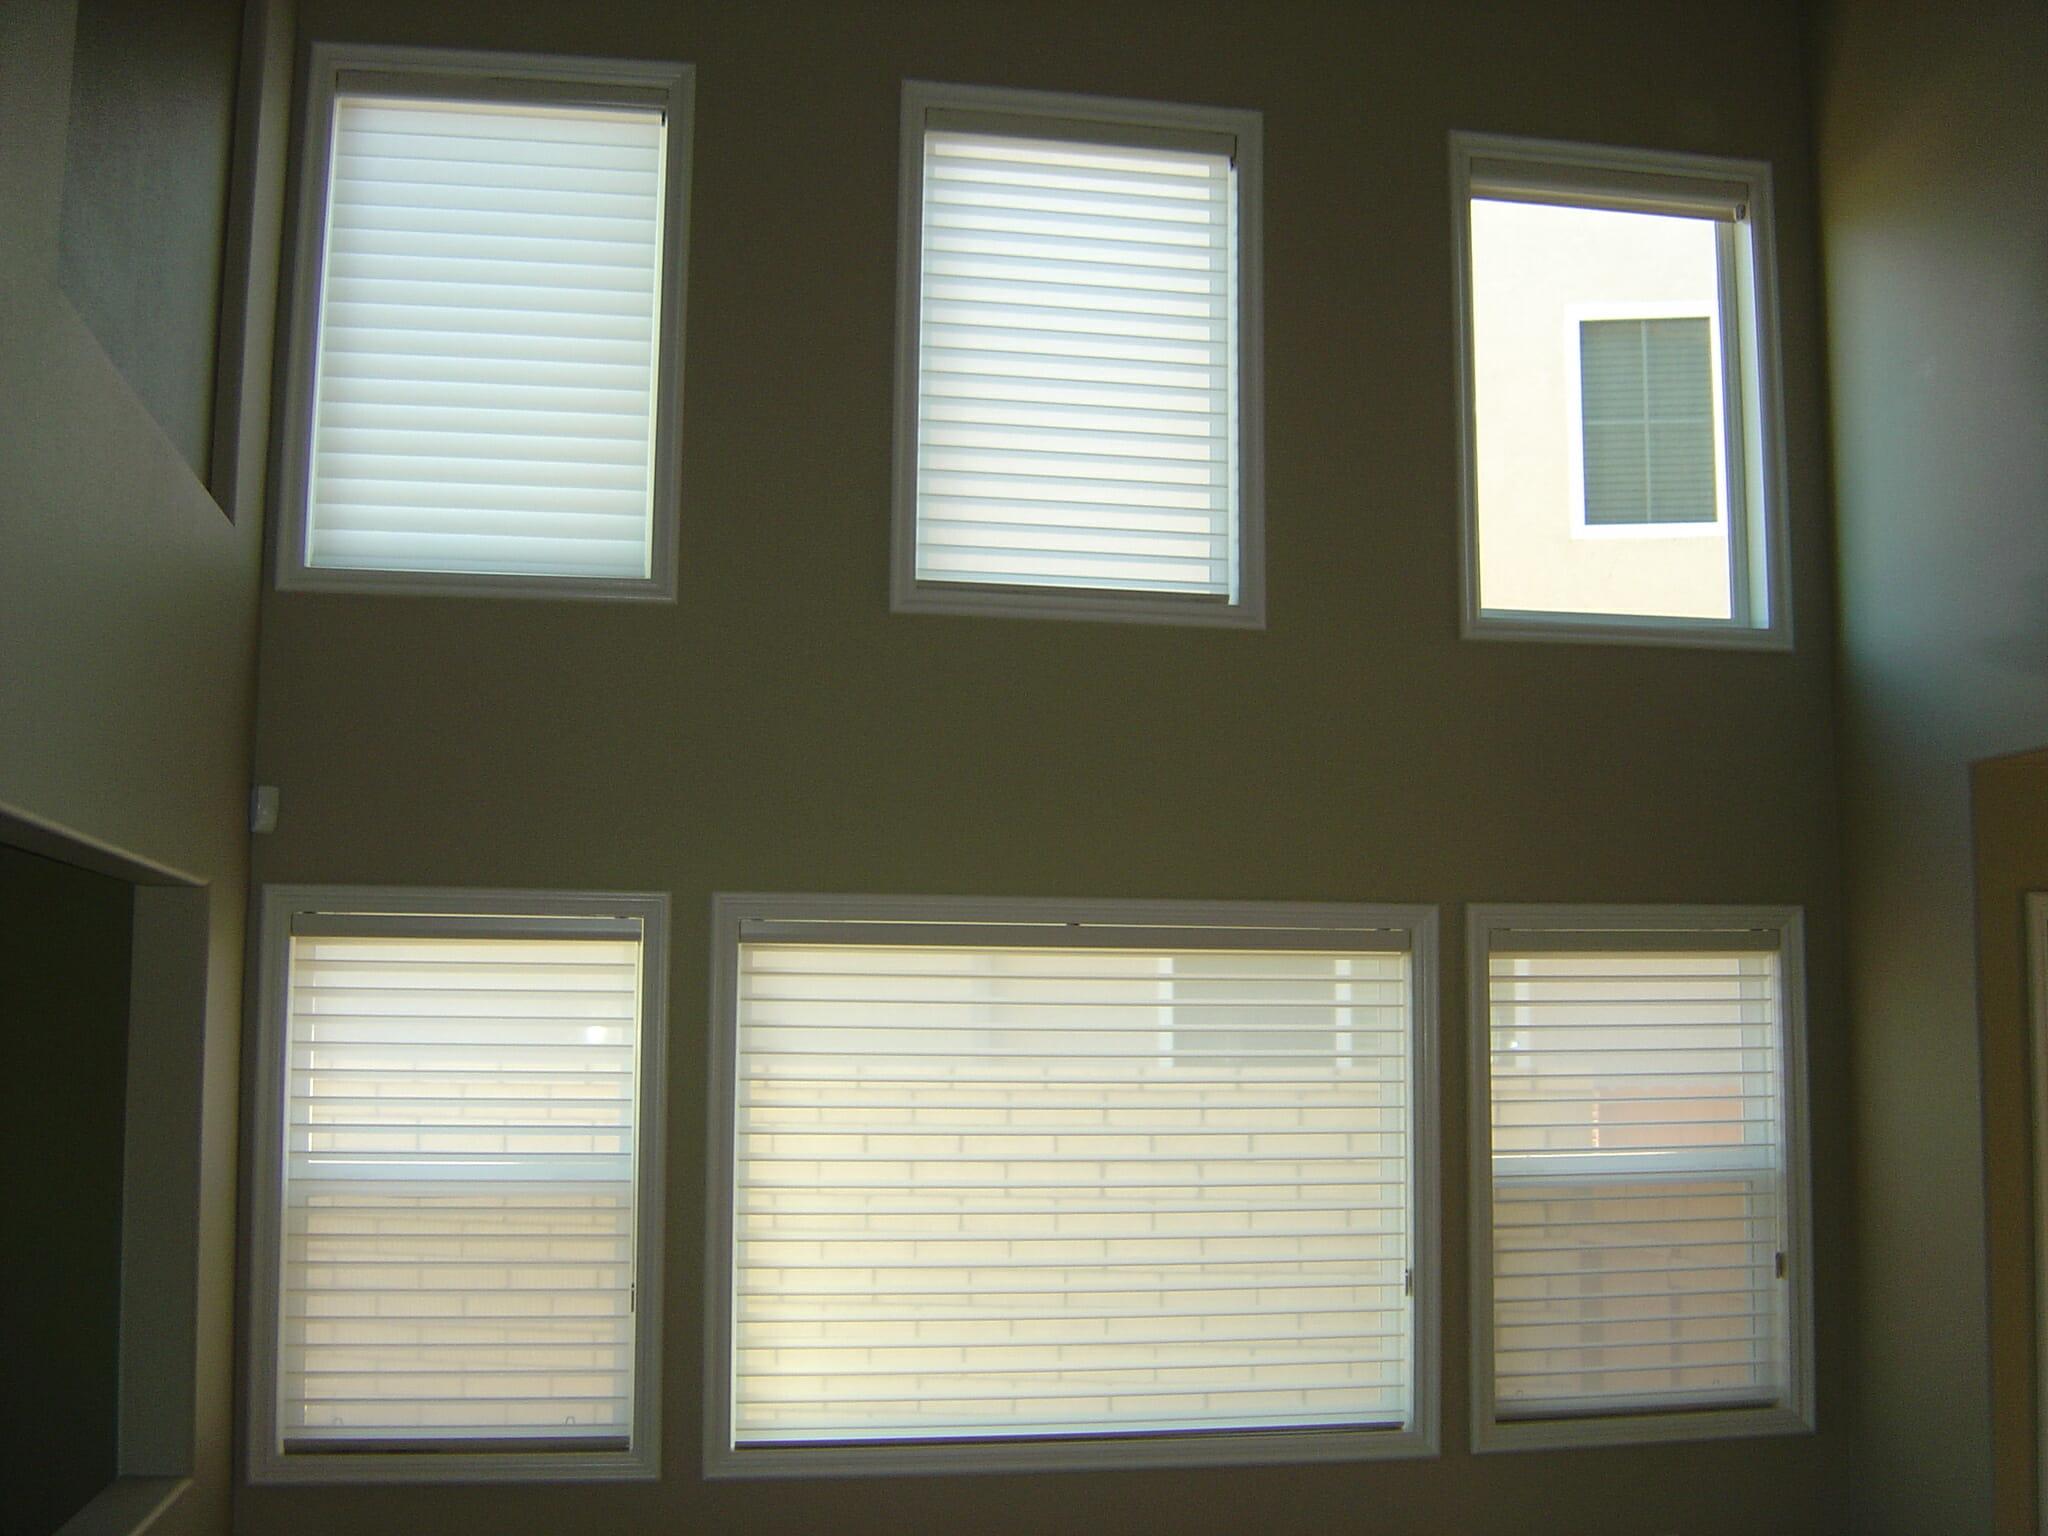 Solar Window Screens 3 Blind Mice Window Coverings